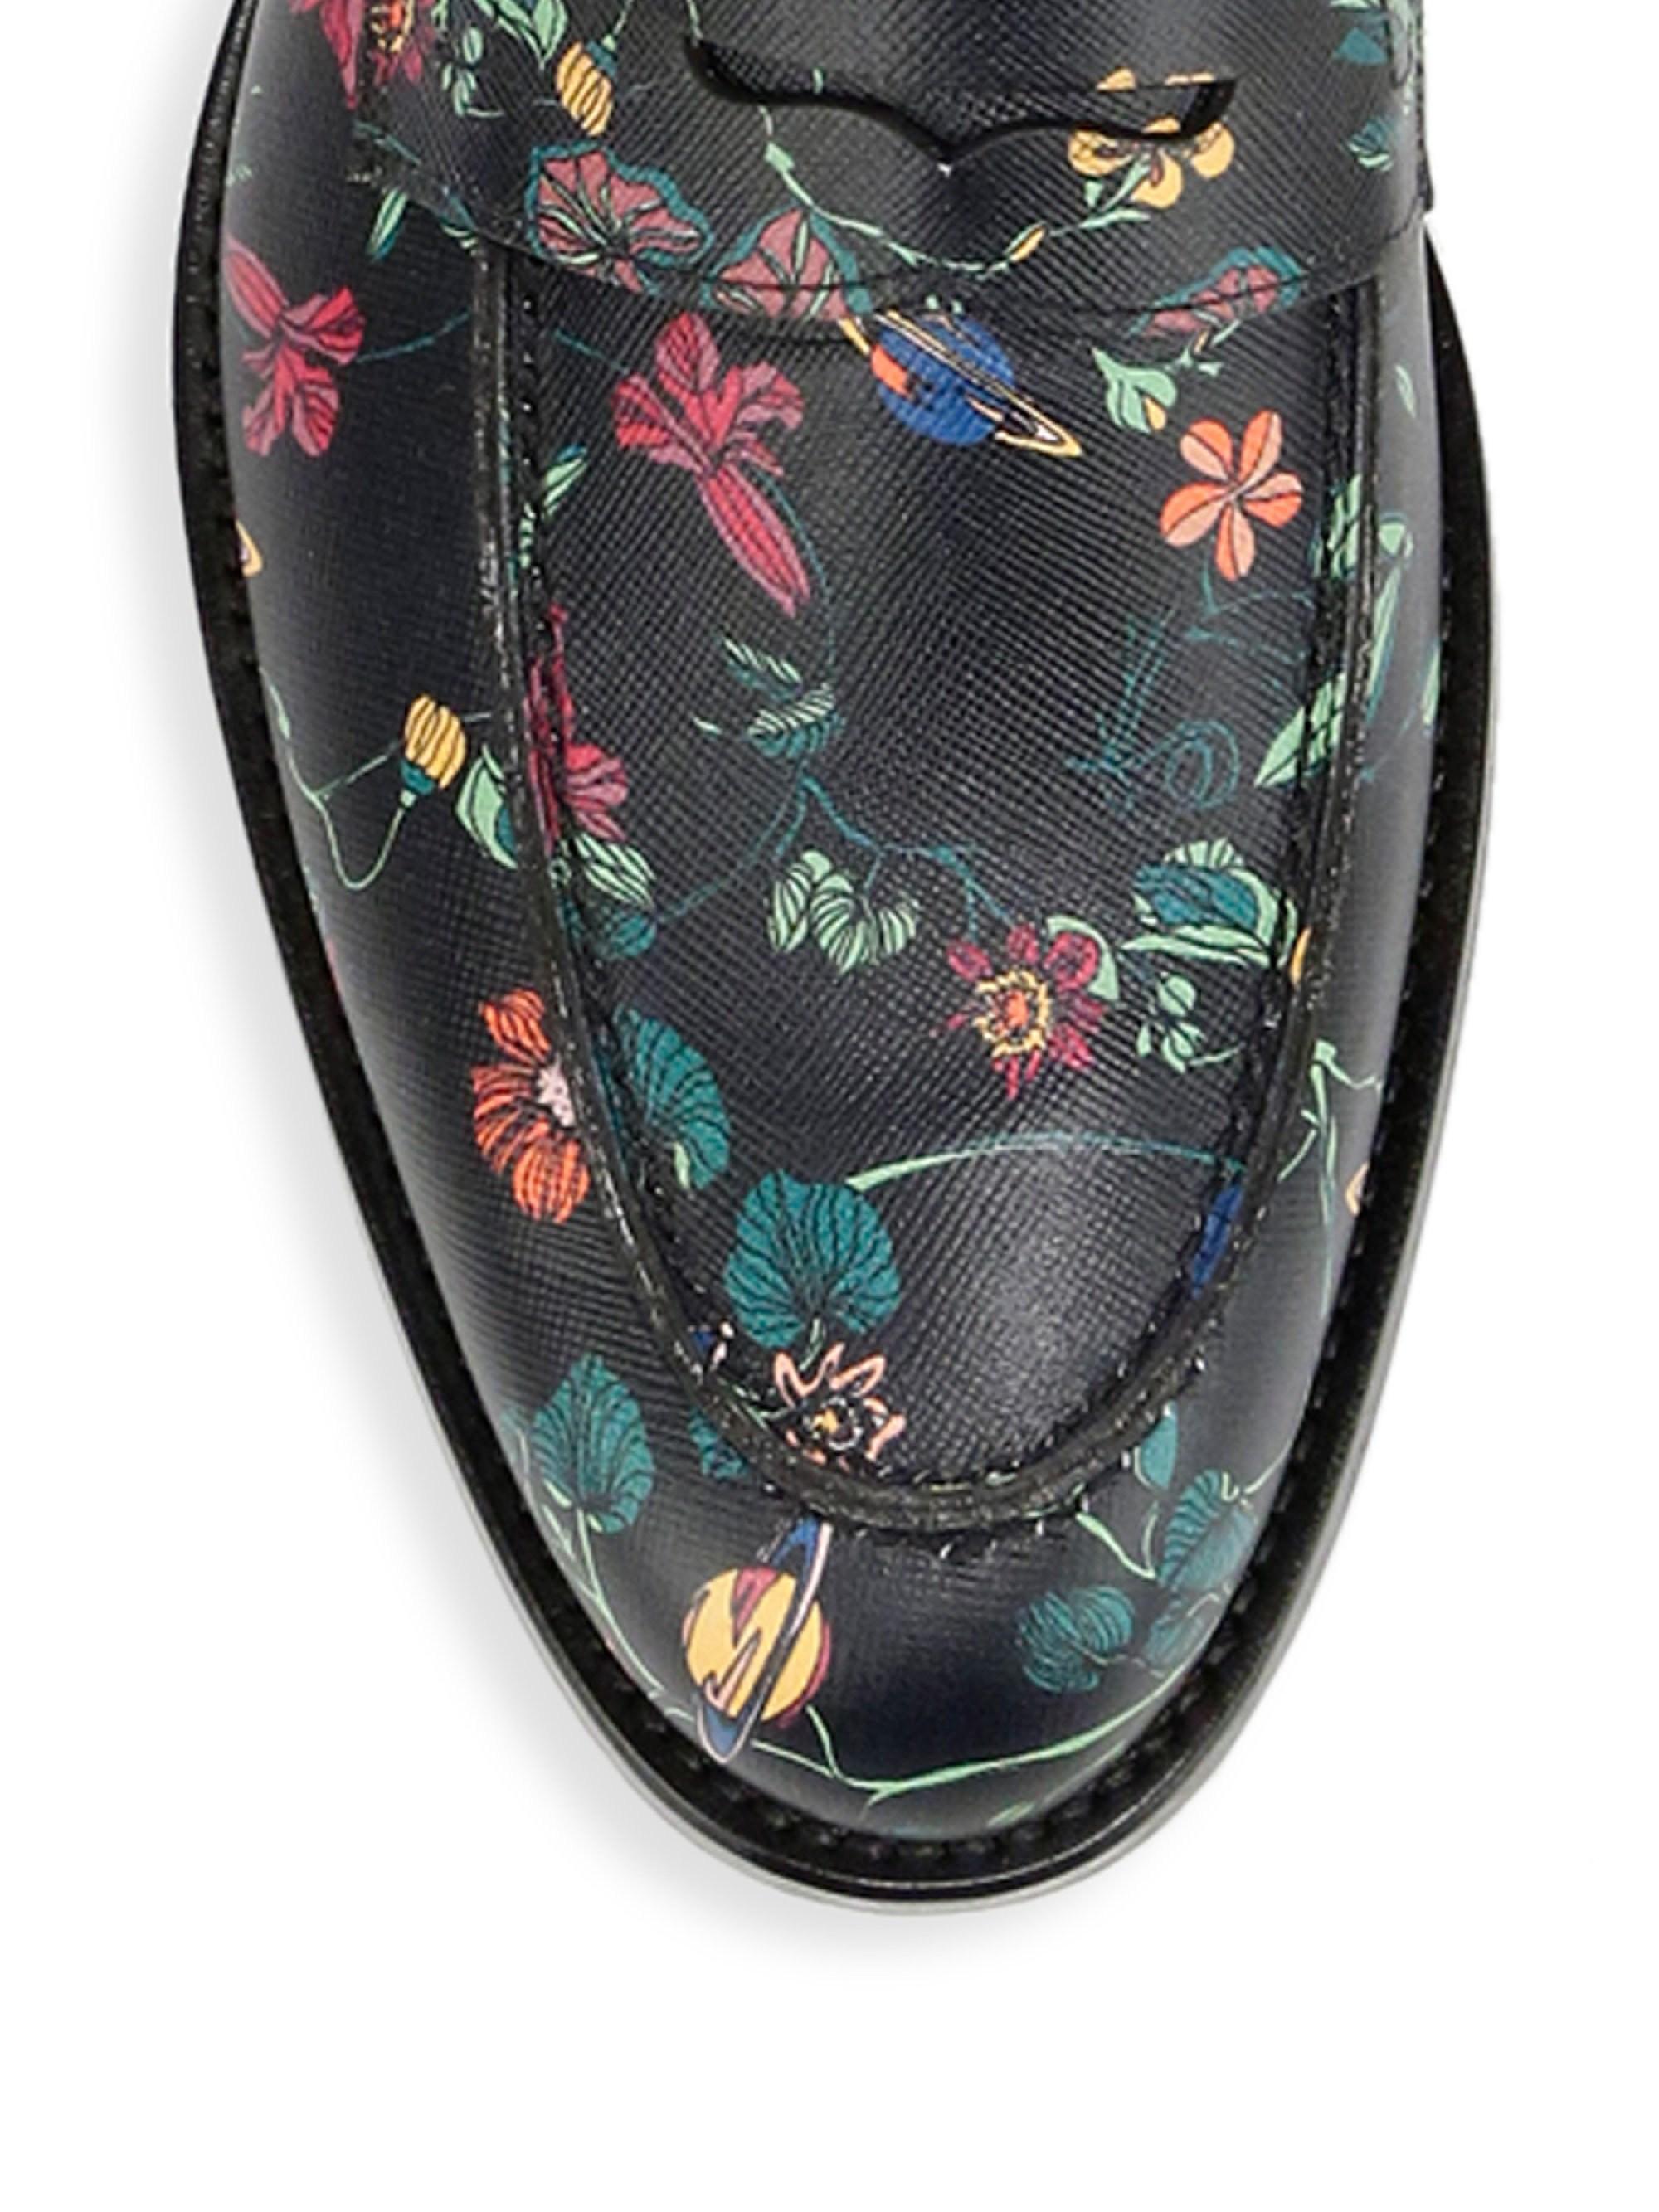 79d1d78d79b Lyst - Paul Smith Men s Floral-print Leather Penny Loafers - Floral ...